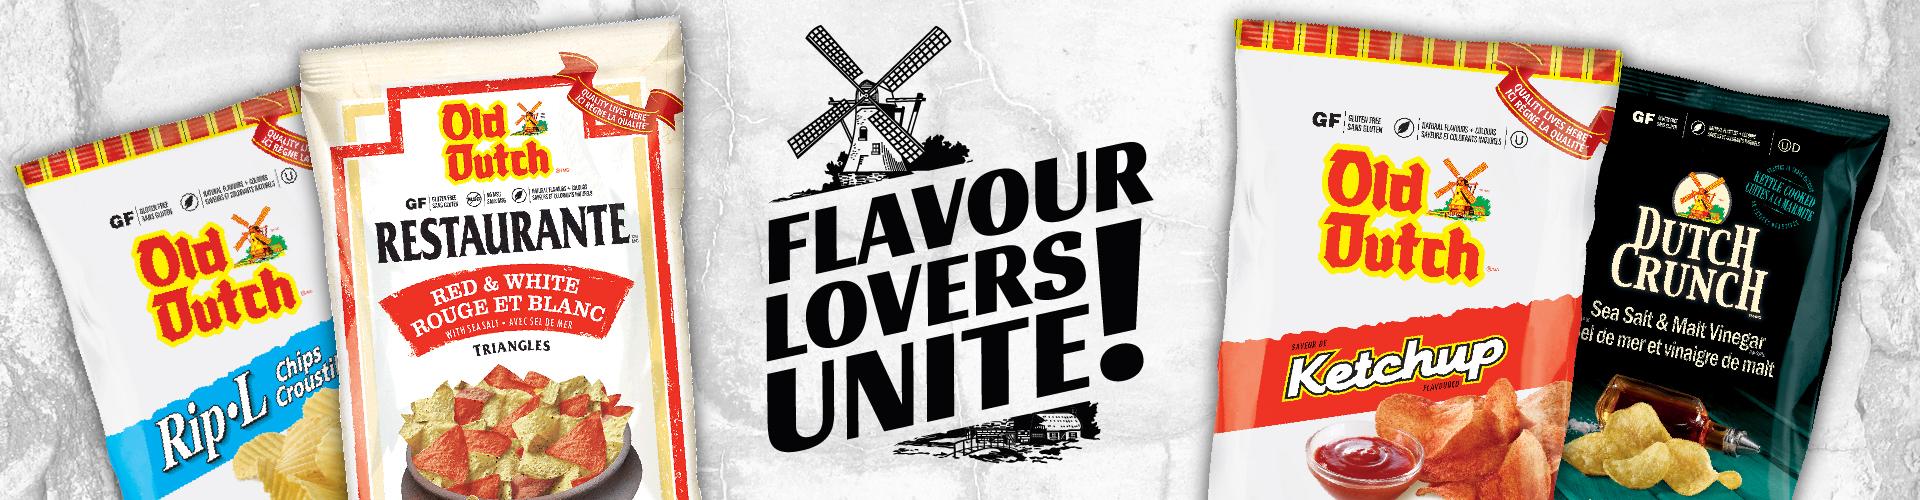 Flavour Lovers Unite!